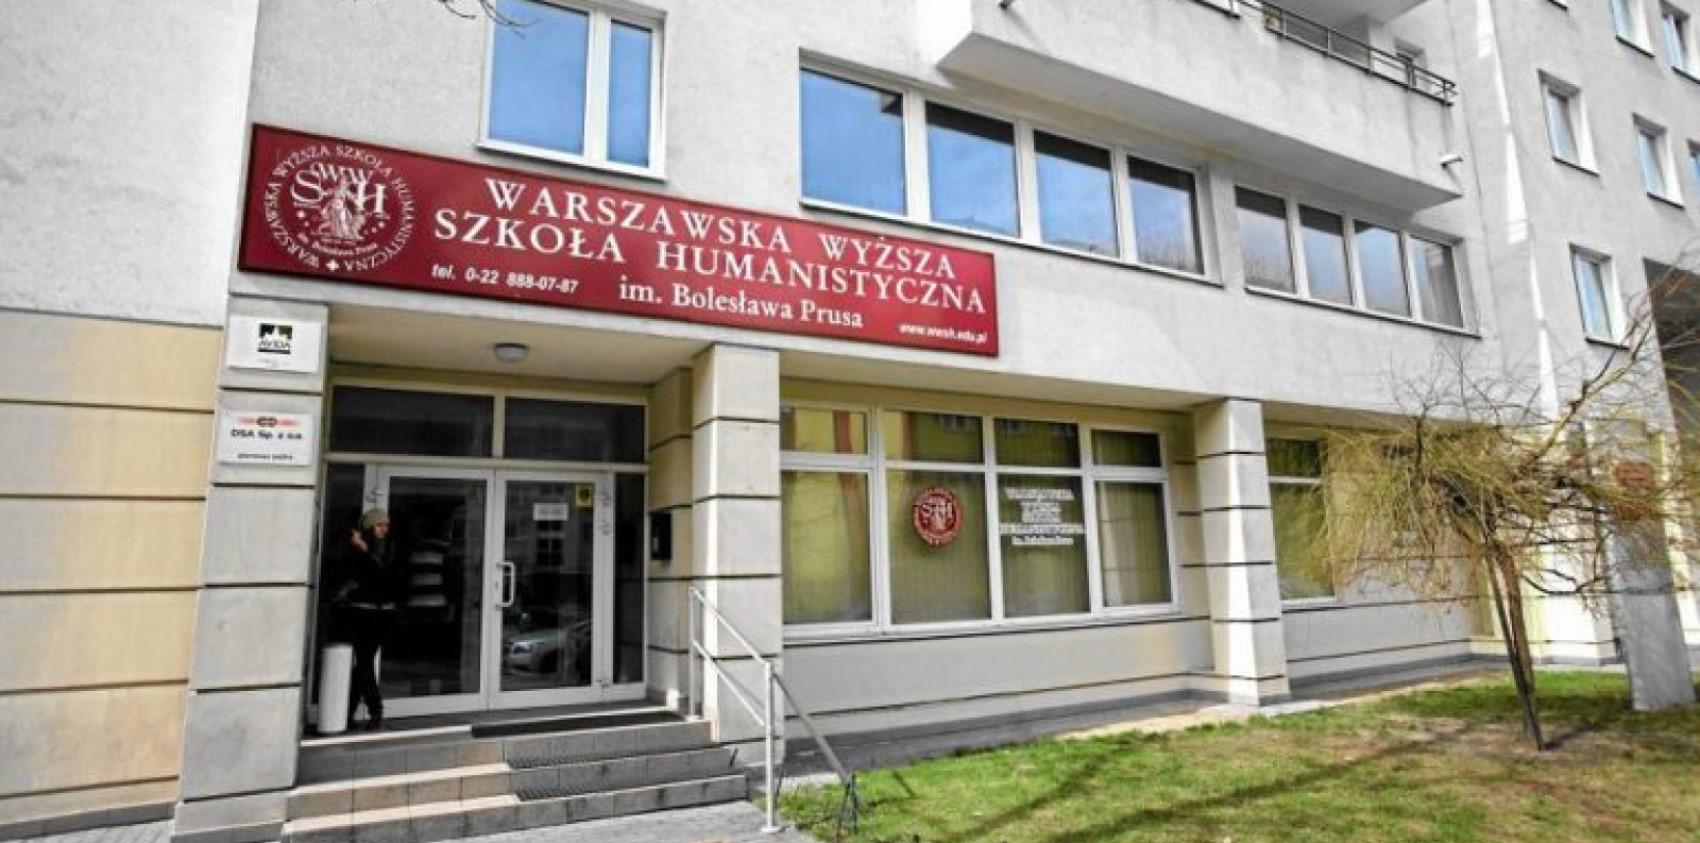 Варшавська Вища Школа Гуманітарних Наук імені Болеслава Пруса